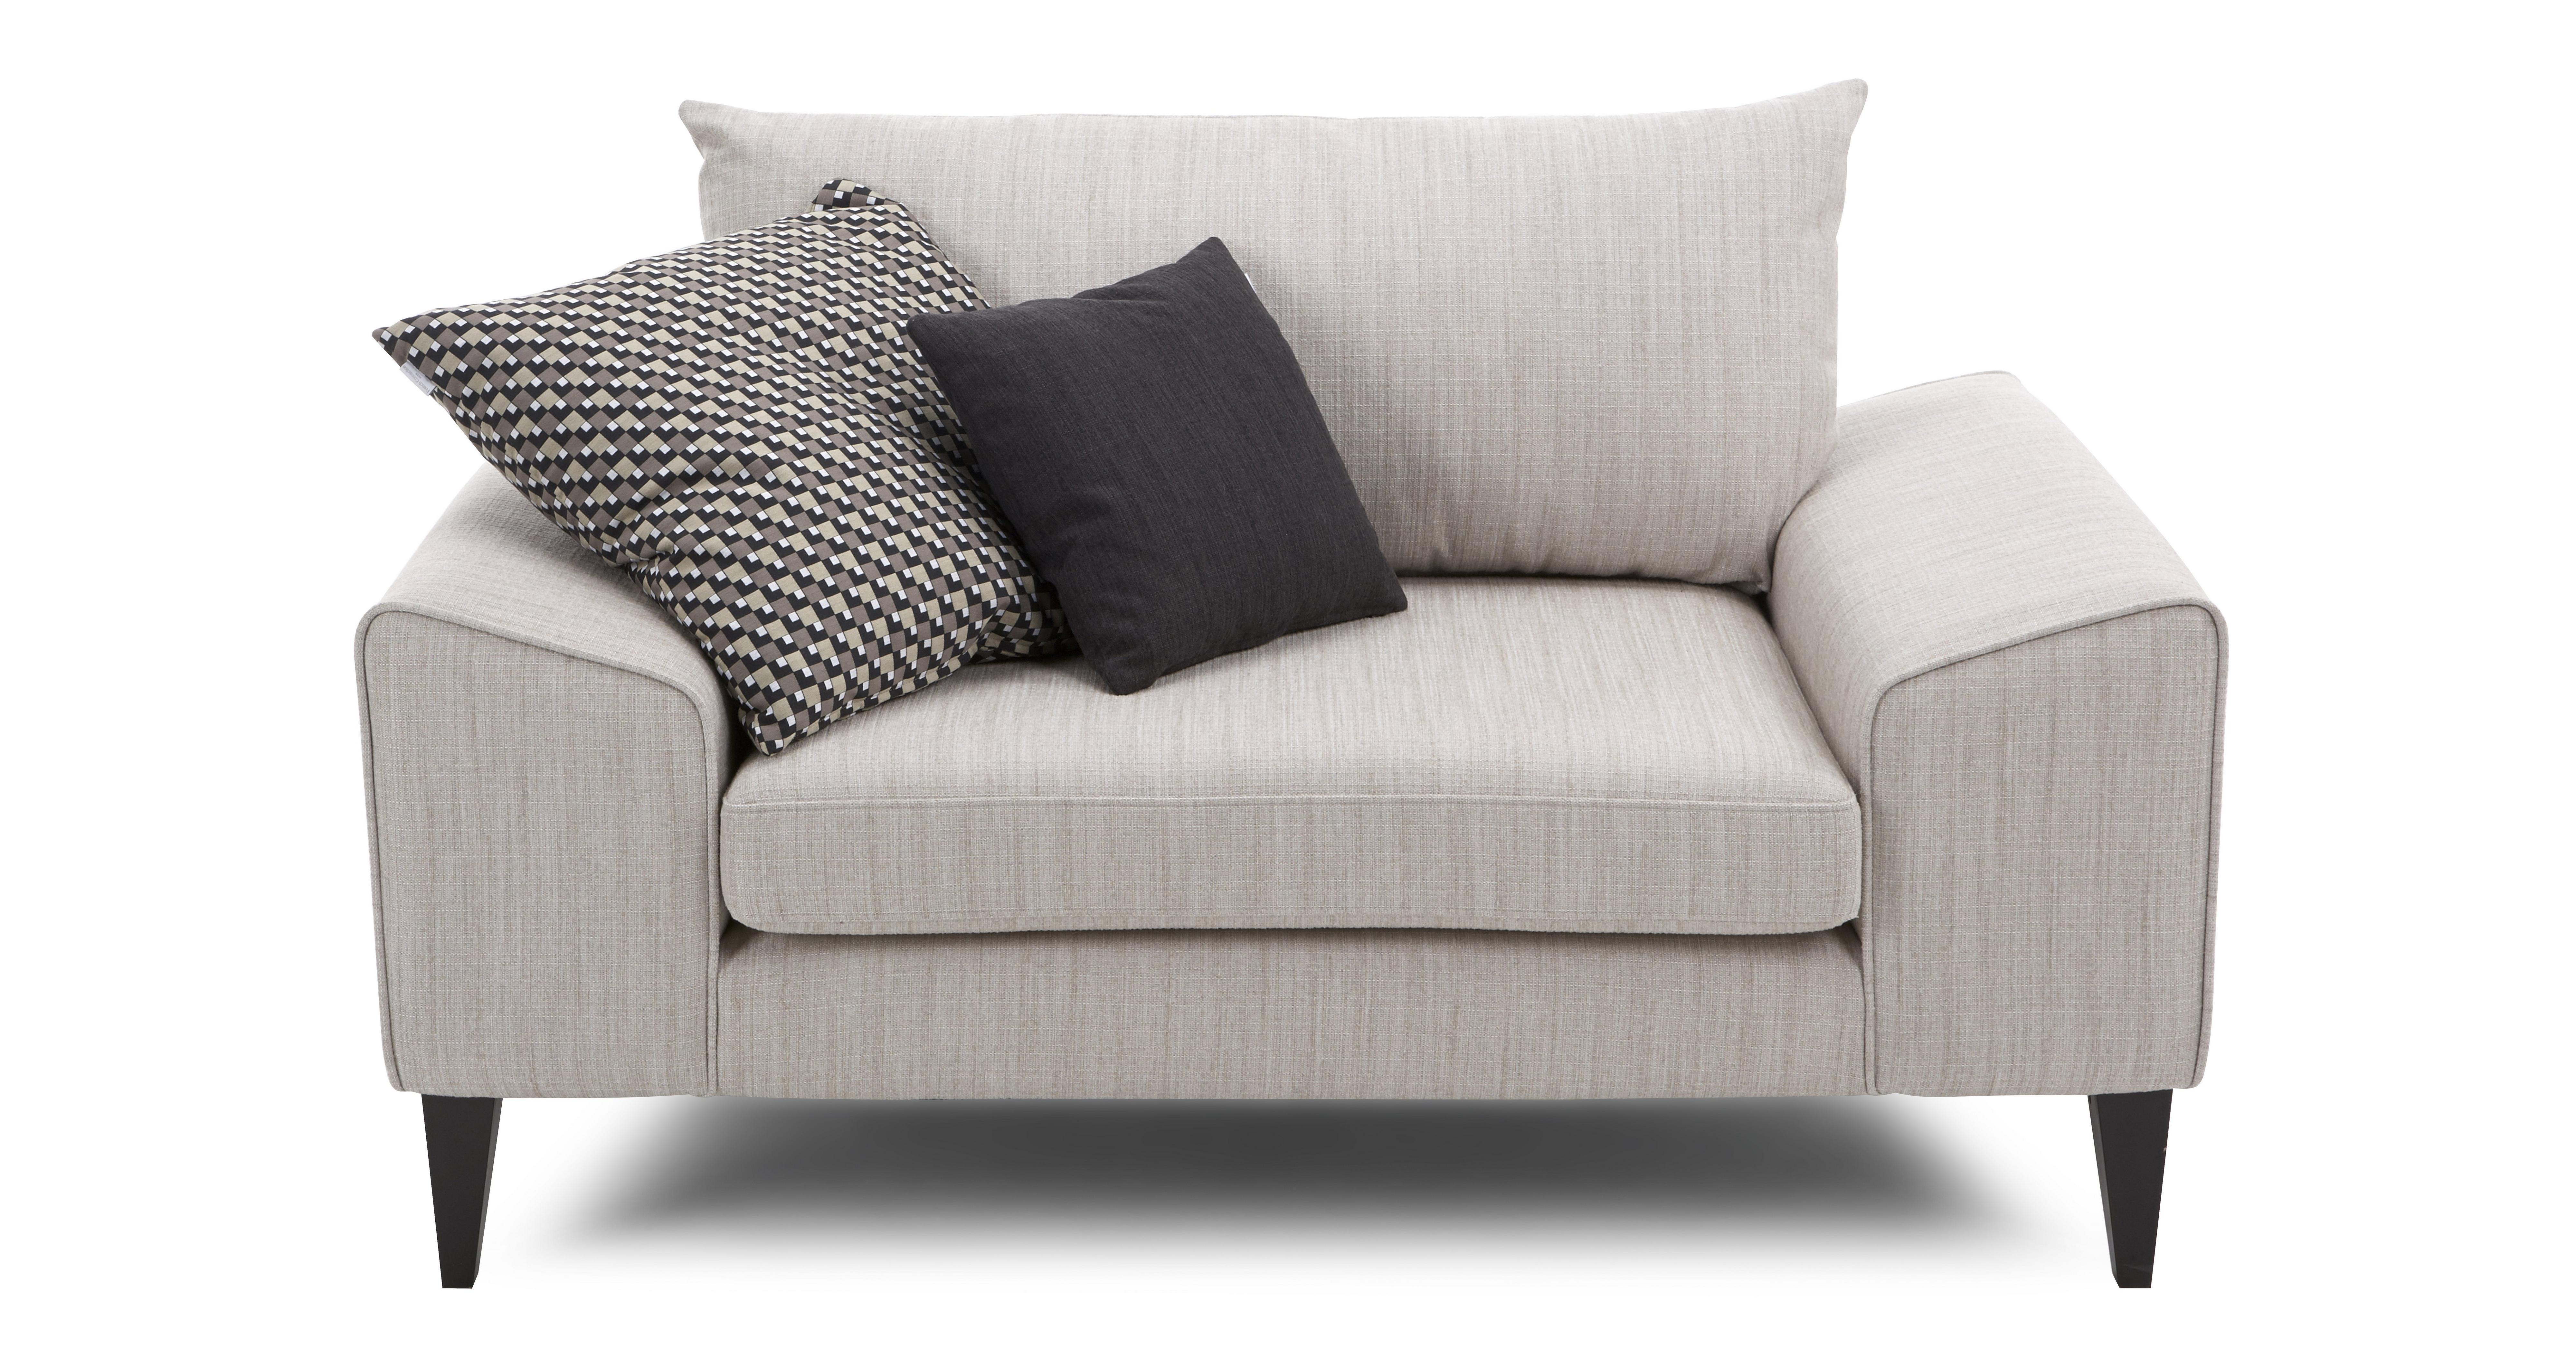 Loveseat Chair Dfs